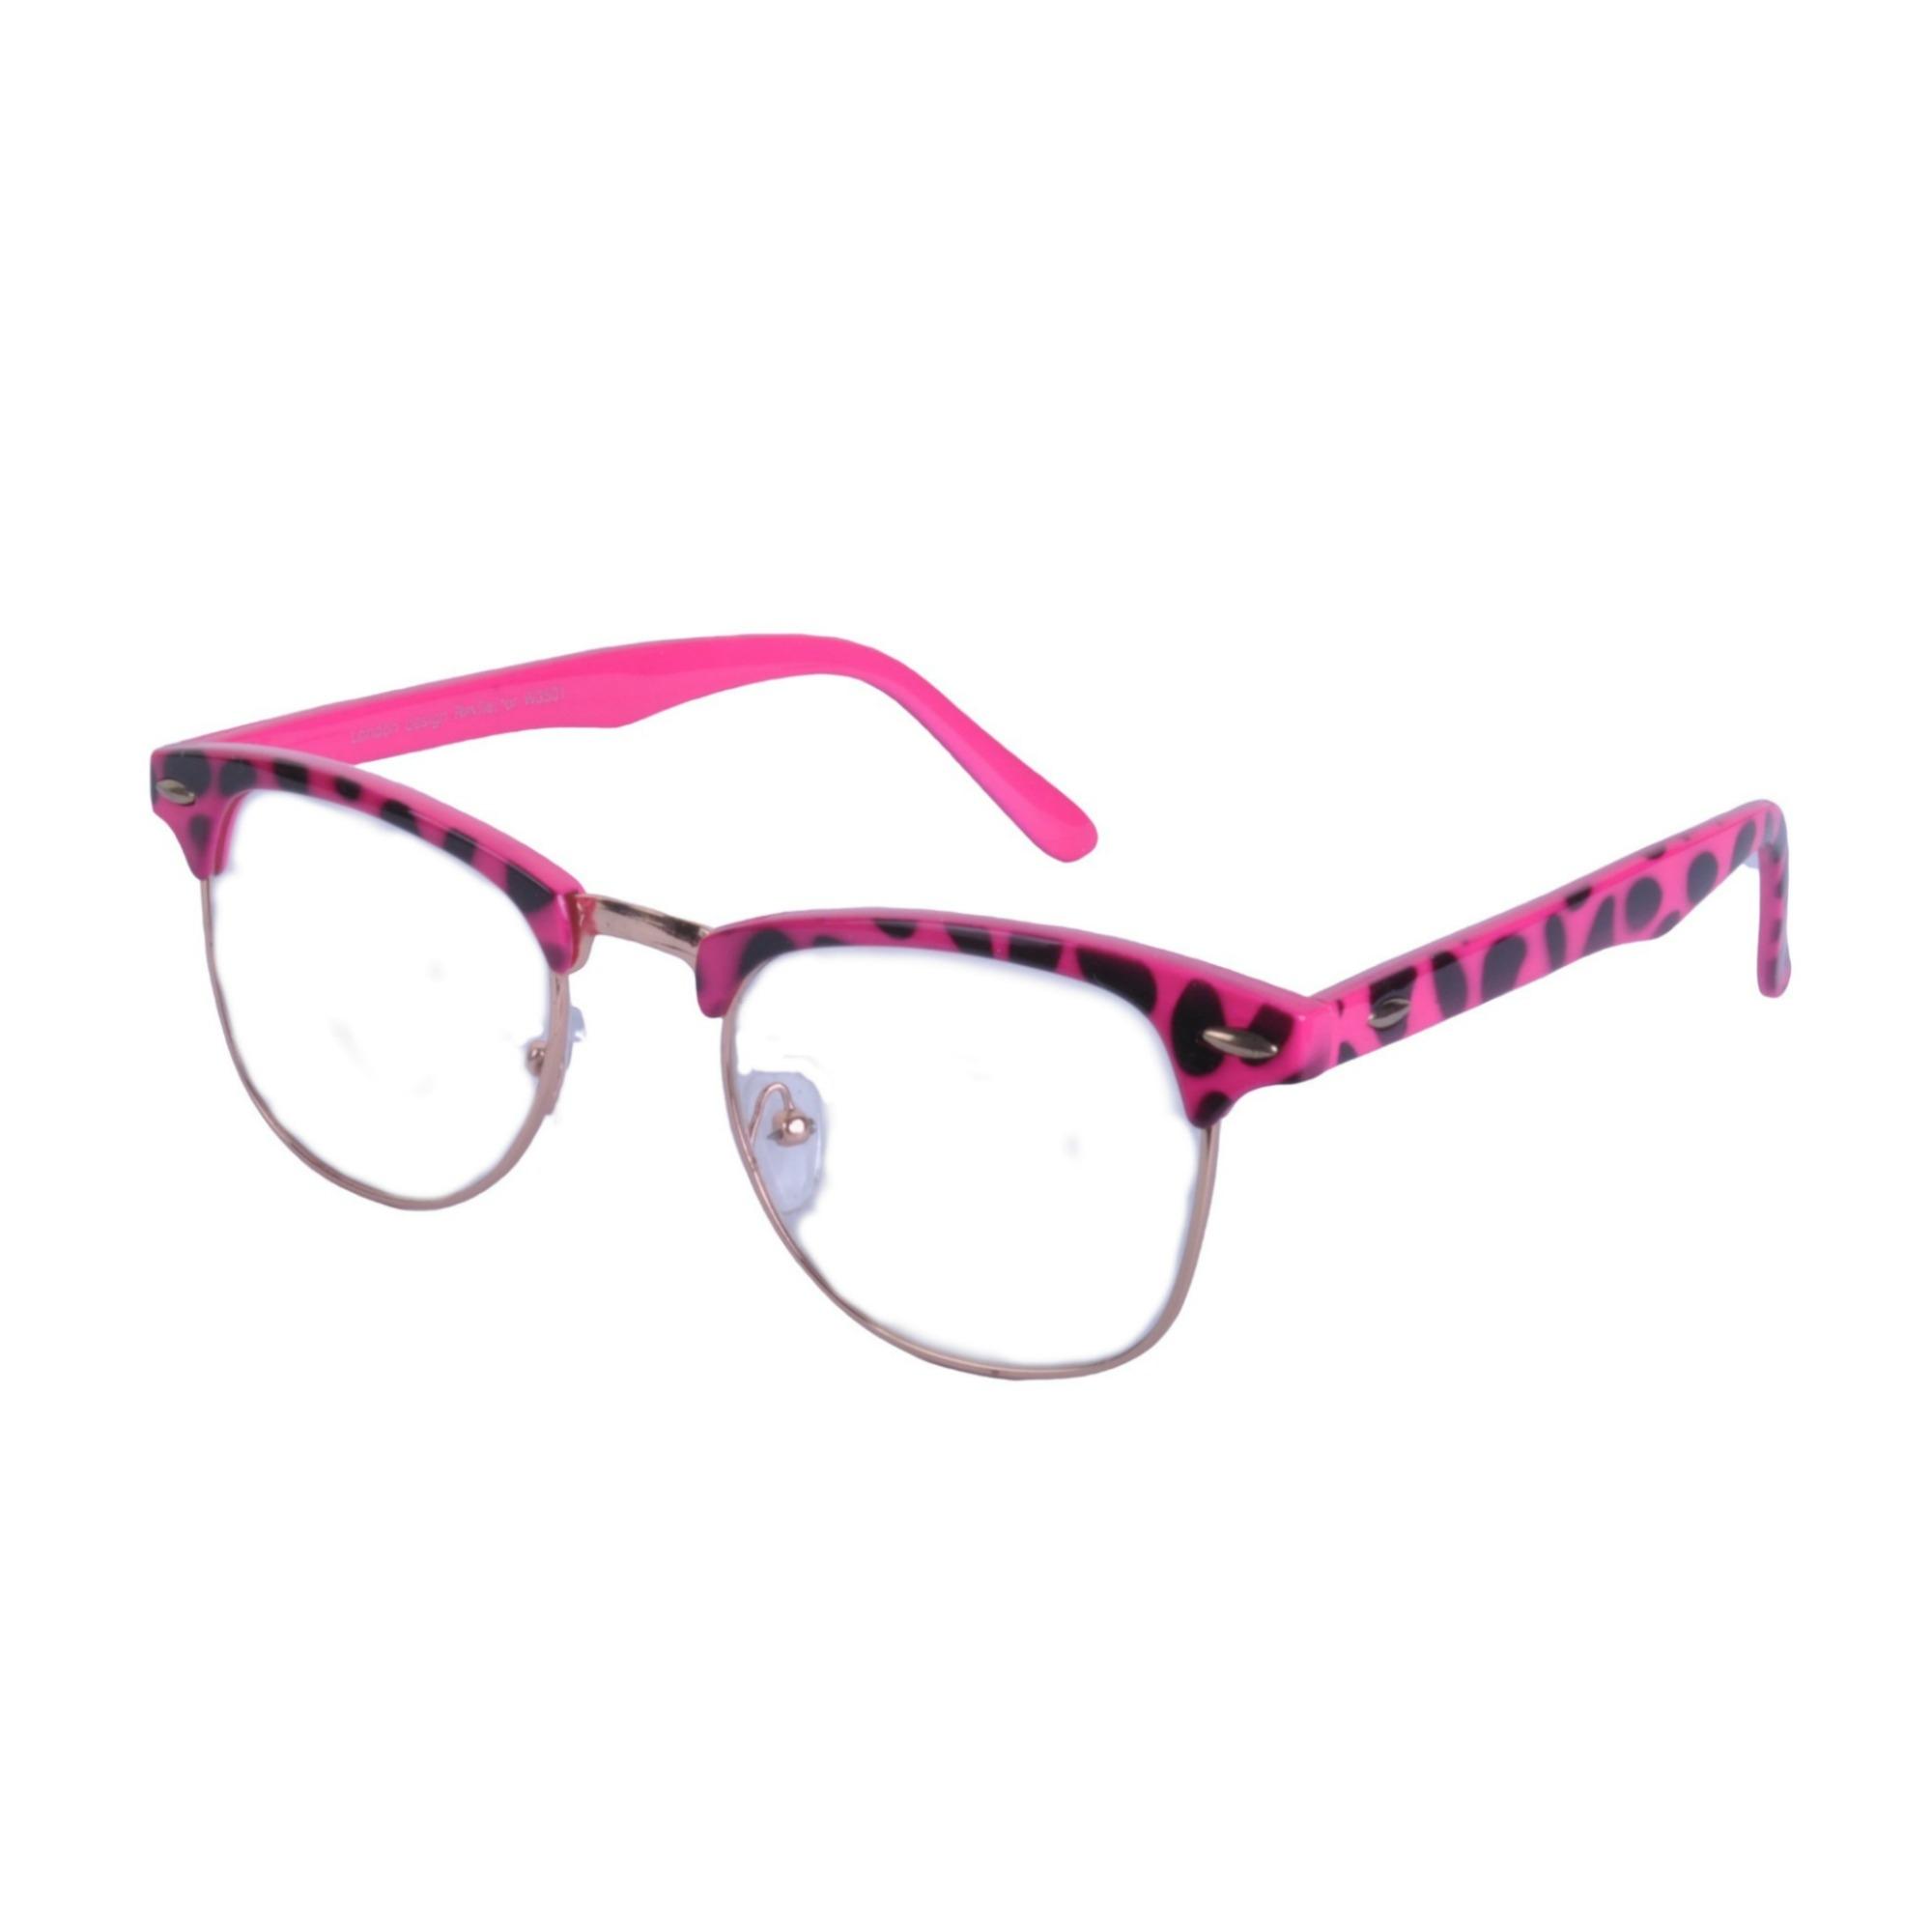 Vintage-Lente-Transparente-Cejas-Barra-Gafas-Gafas-de-Sol-Hron-Borde-Negro miniatura 10